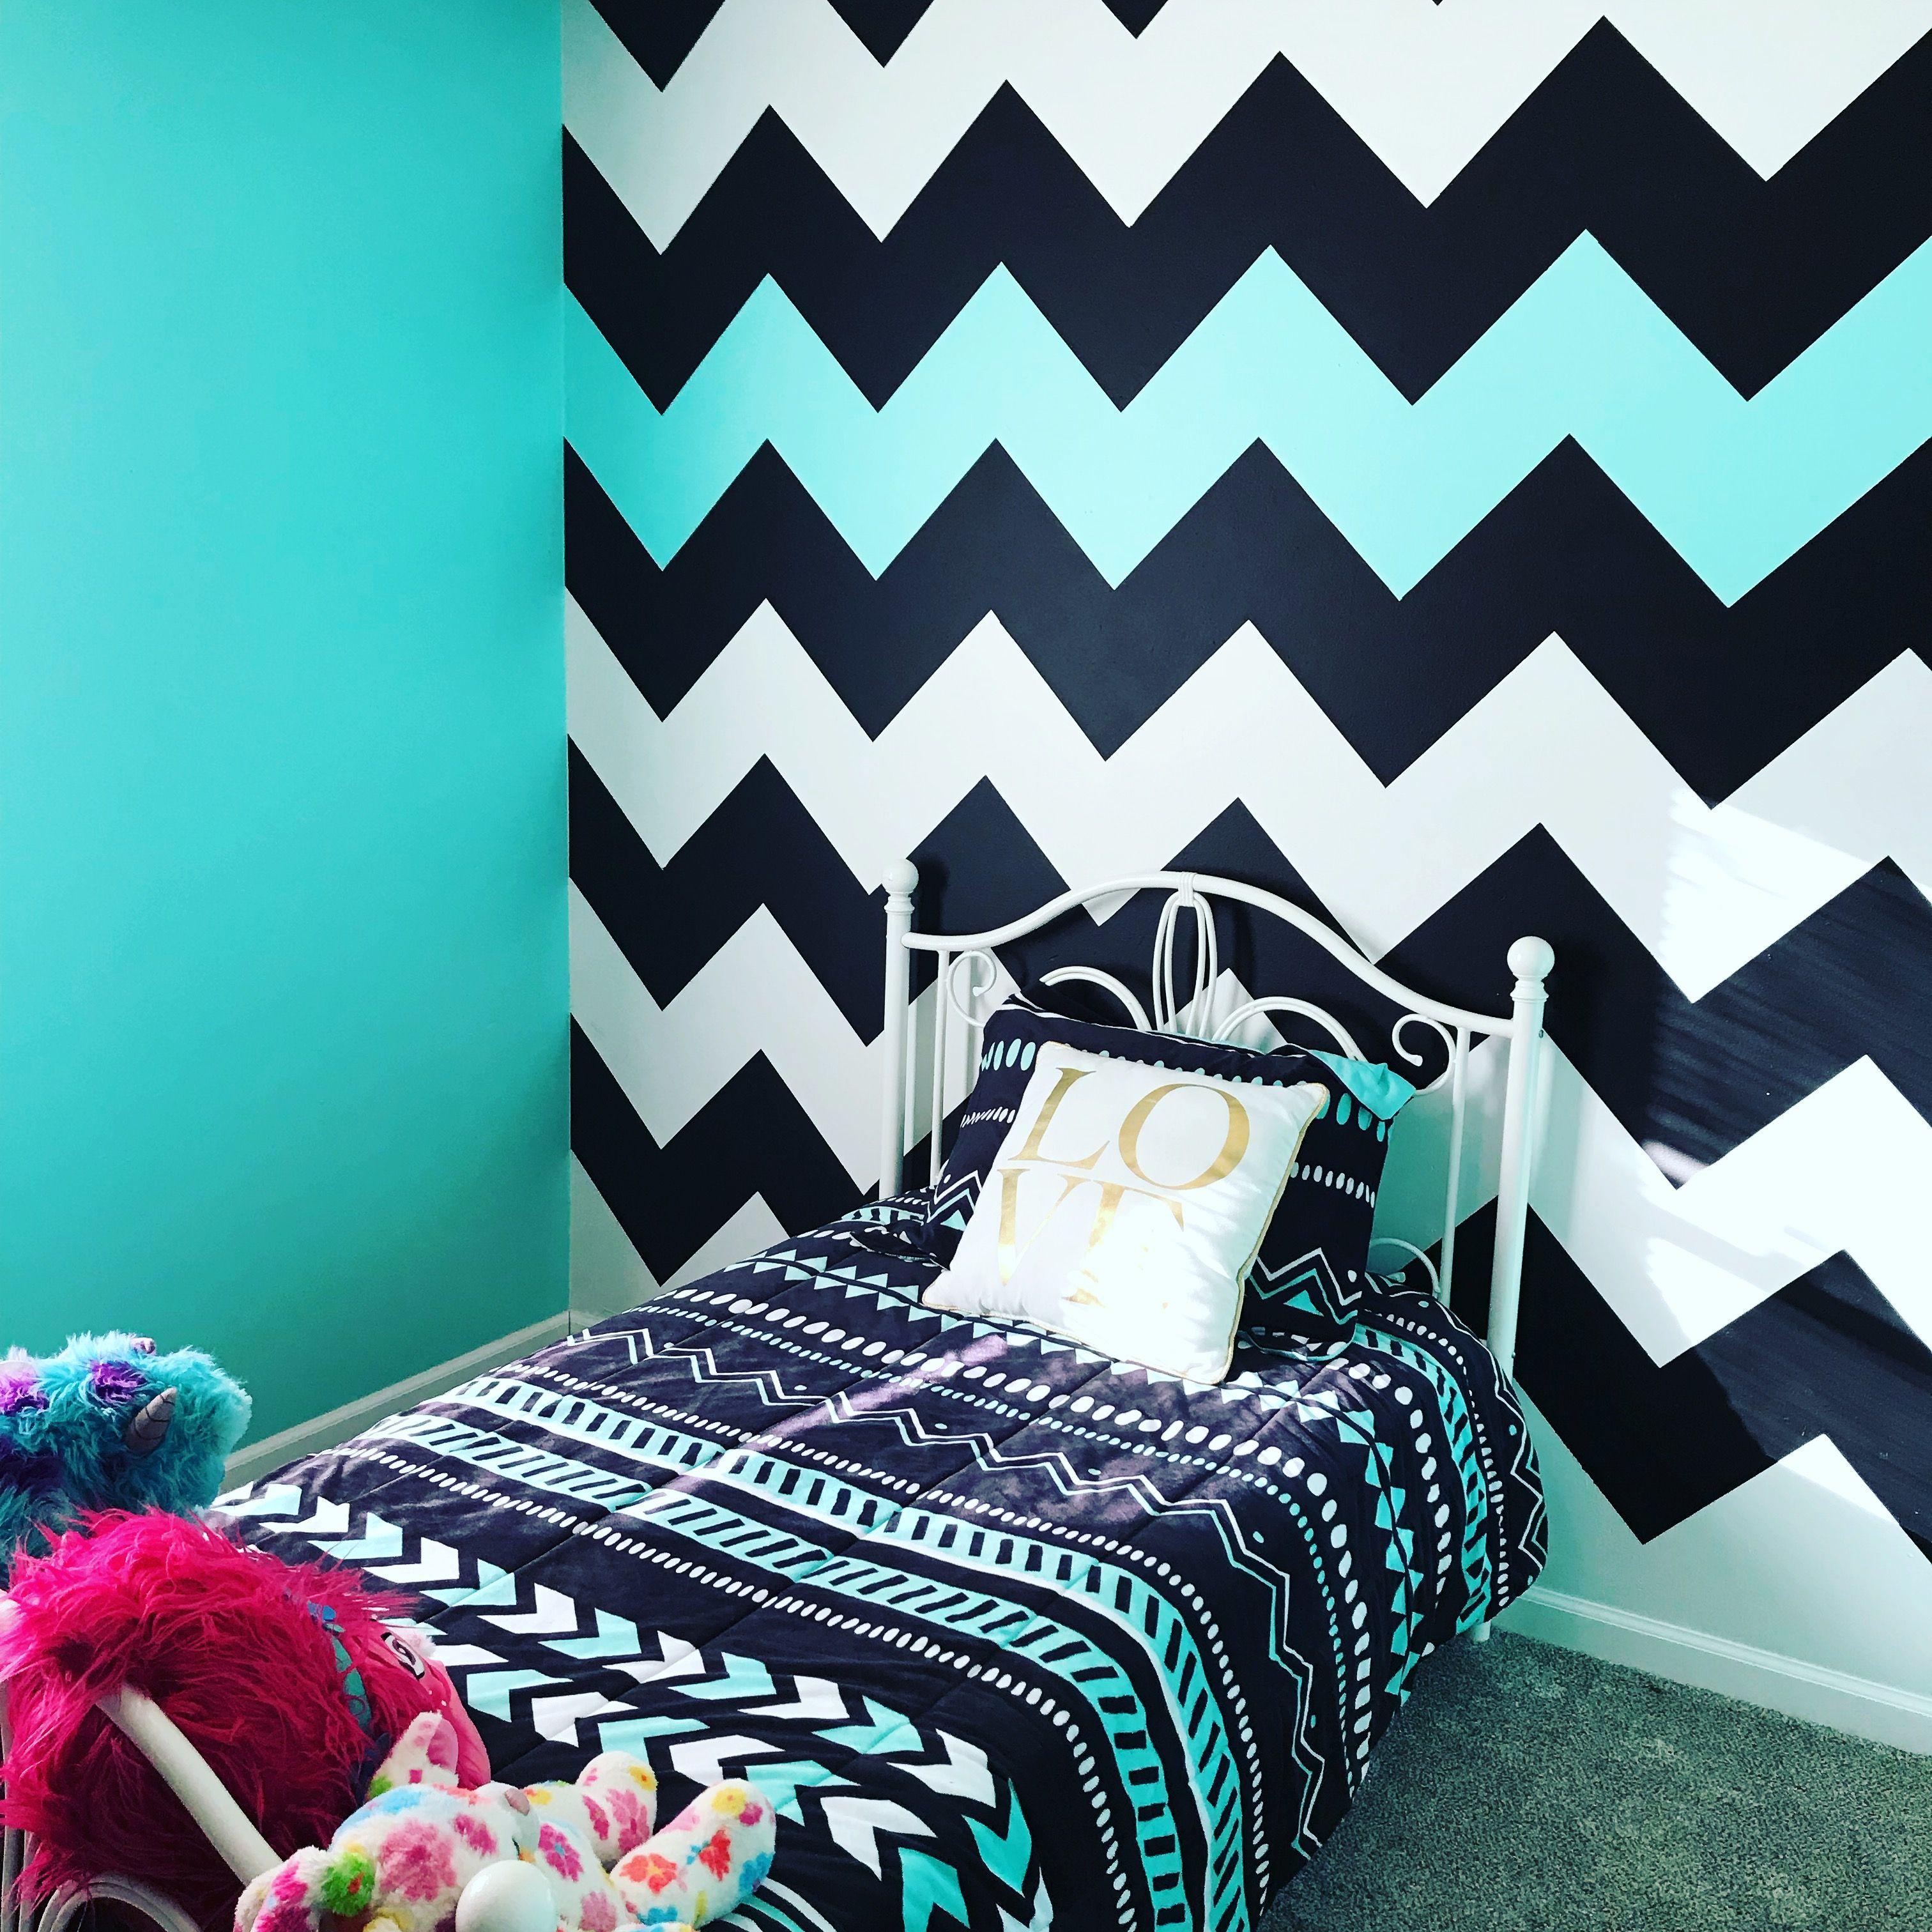 Pin By Poojitha Ramesh On Eva Sophia S Room Bedroom Wall Designs Kid Room Decor Girl Bedroom Designs